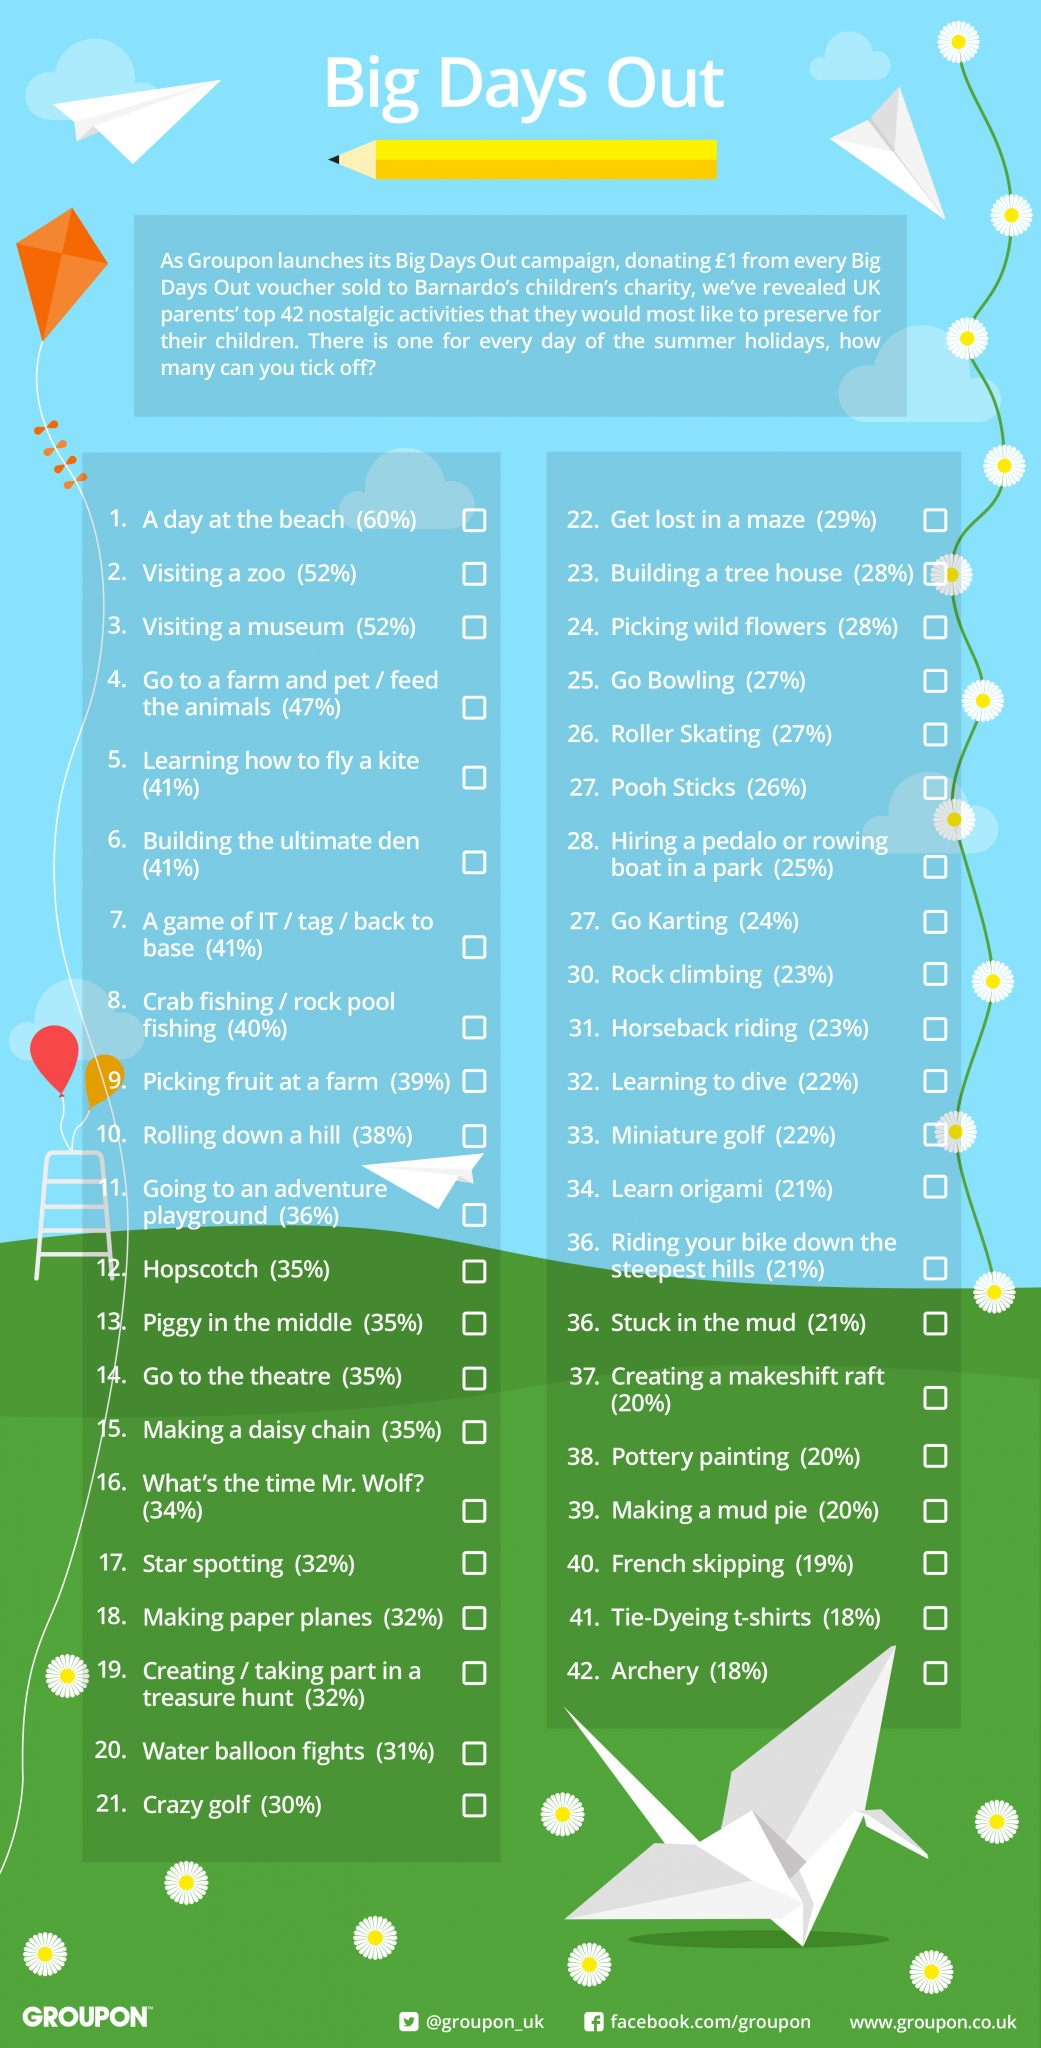 The old fashioned summer fun checklist